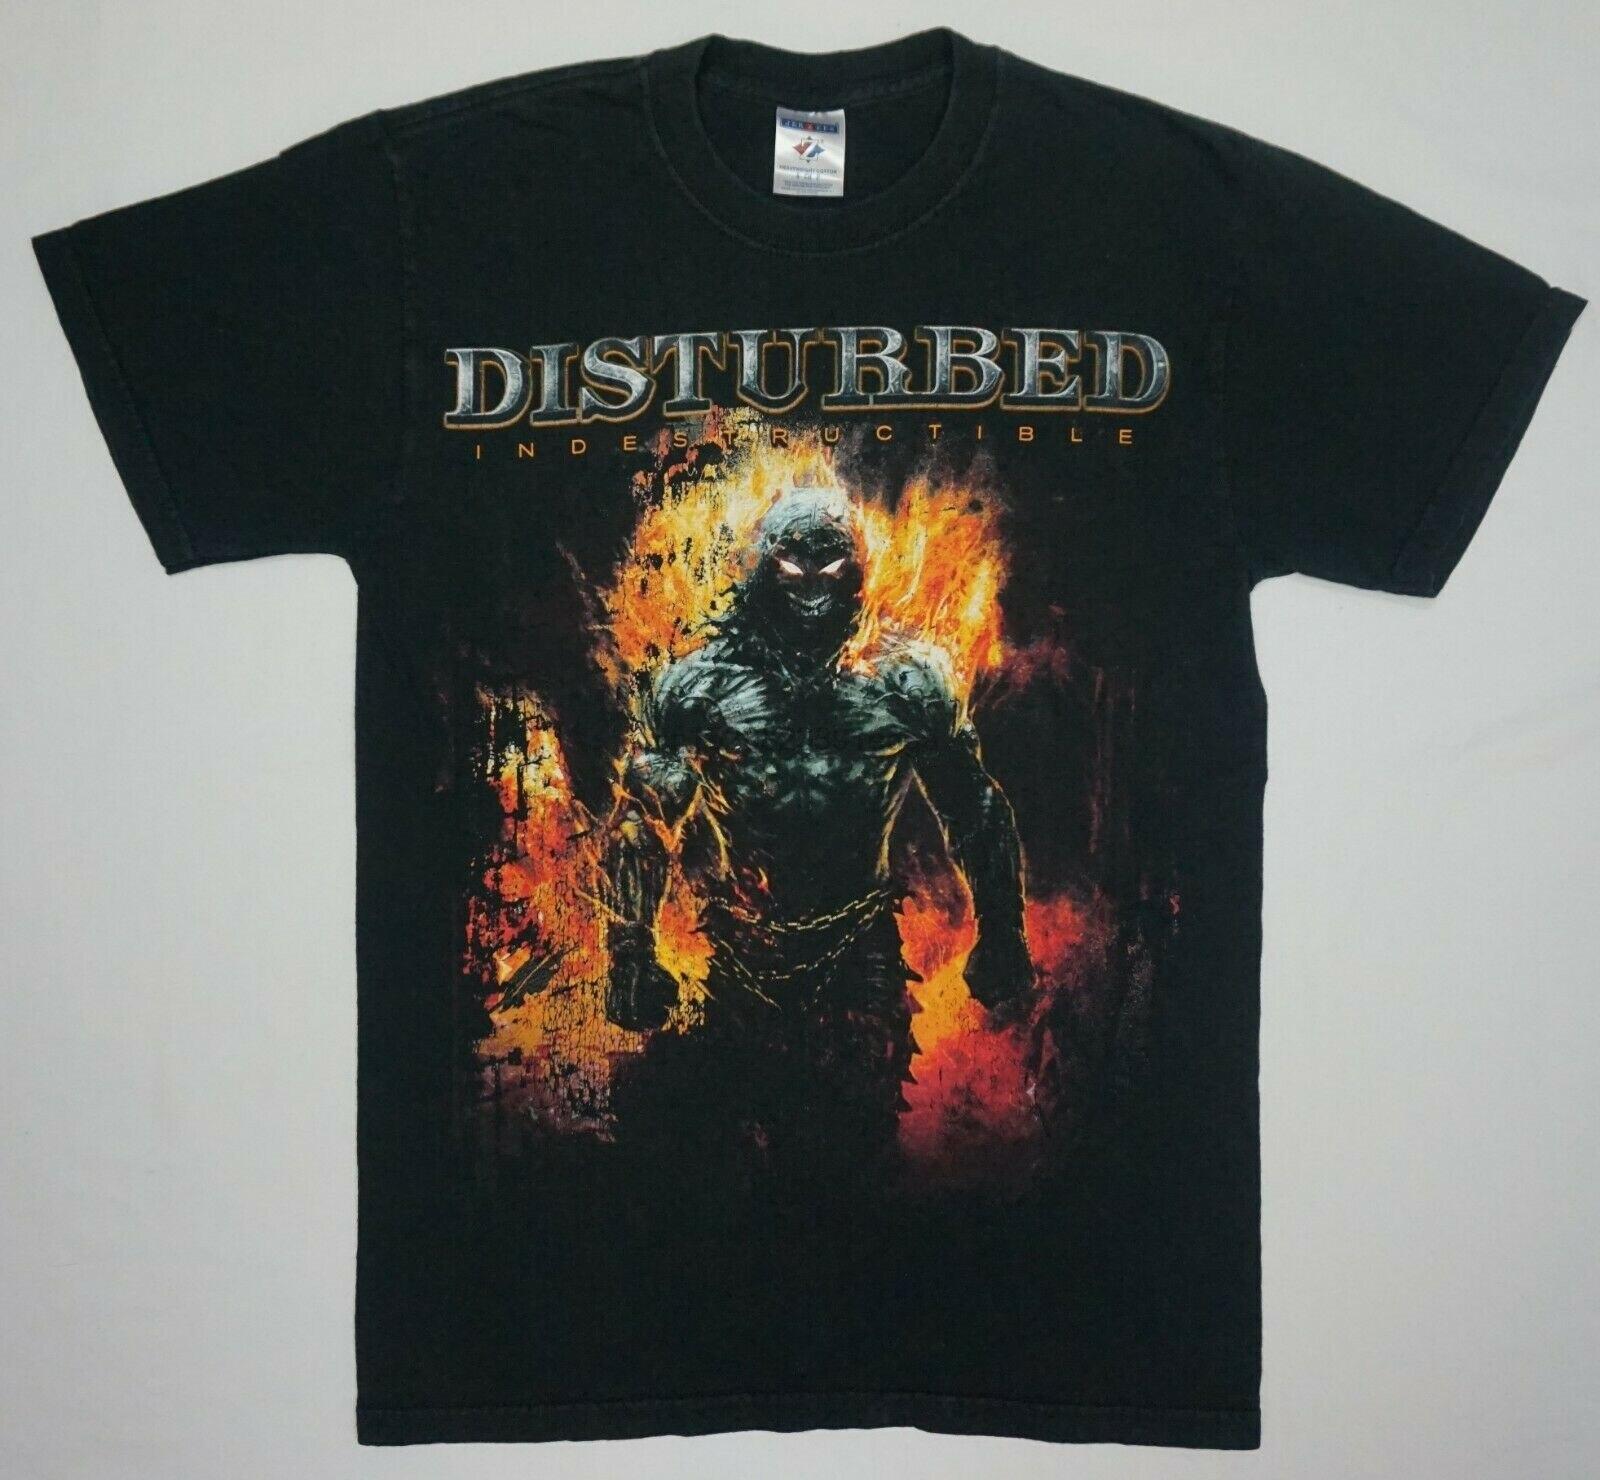 2008 turnê indestrutível perturbado t camisa tamanho s vtg heavy metal hard rock band 4102m